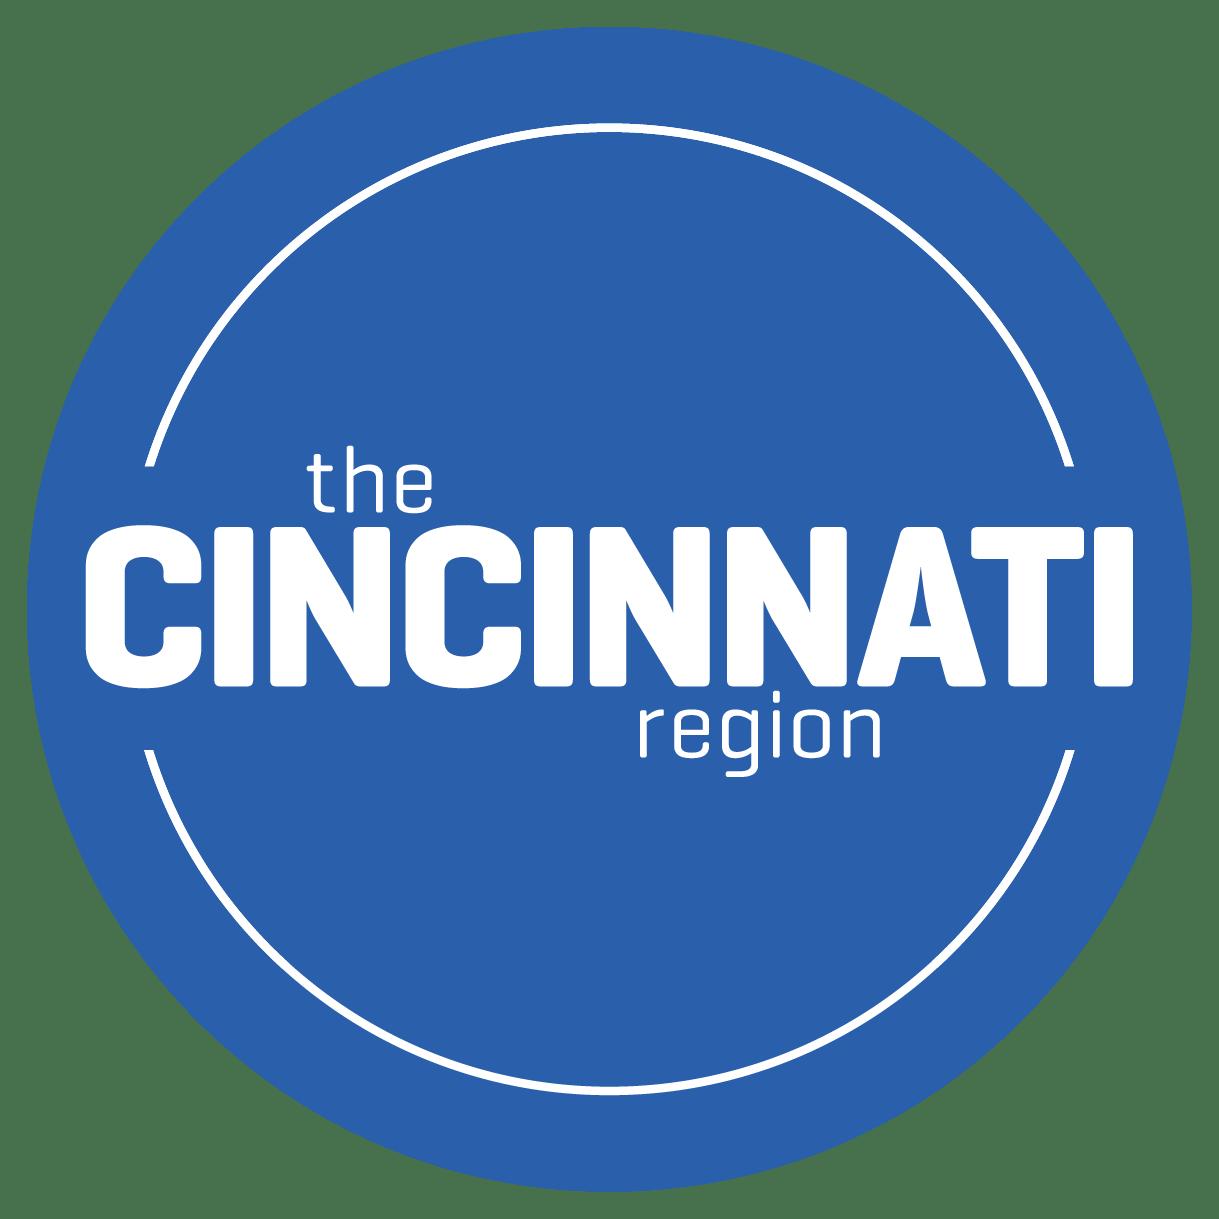 Cincy_logo_RTN_Region_Badge_2019-01